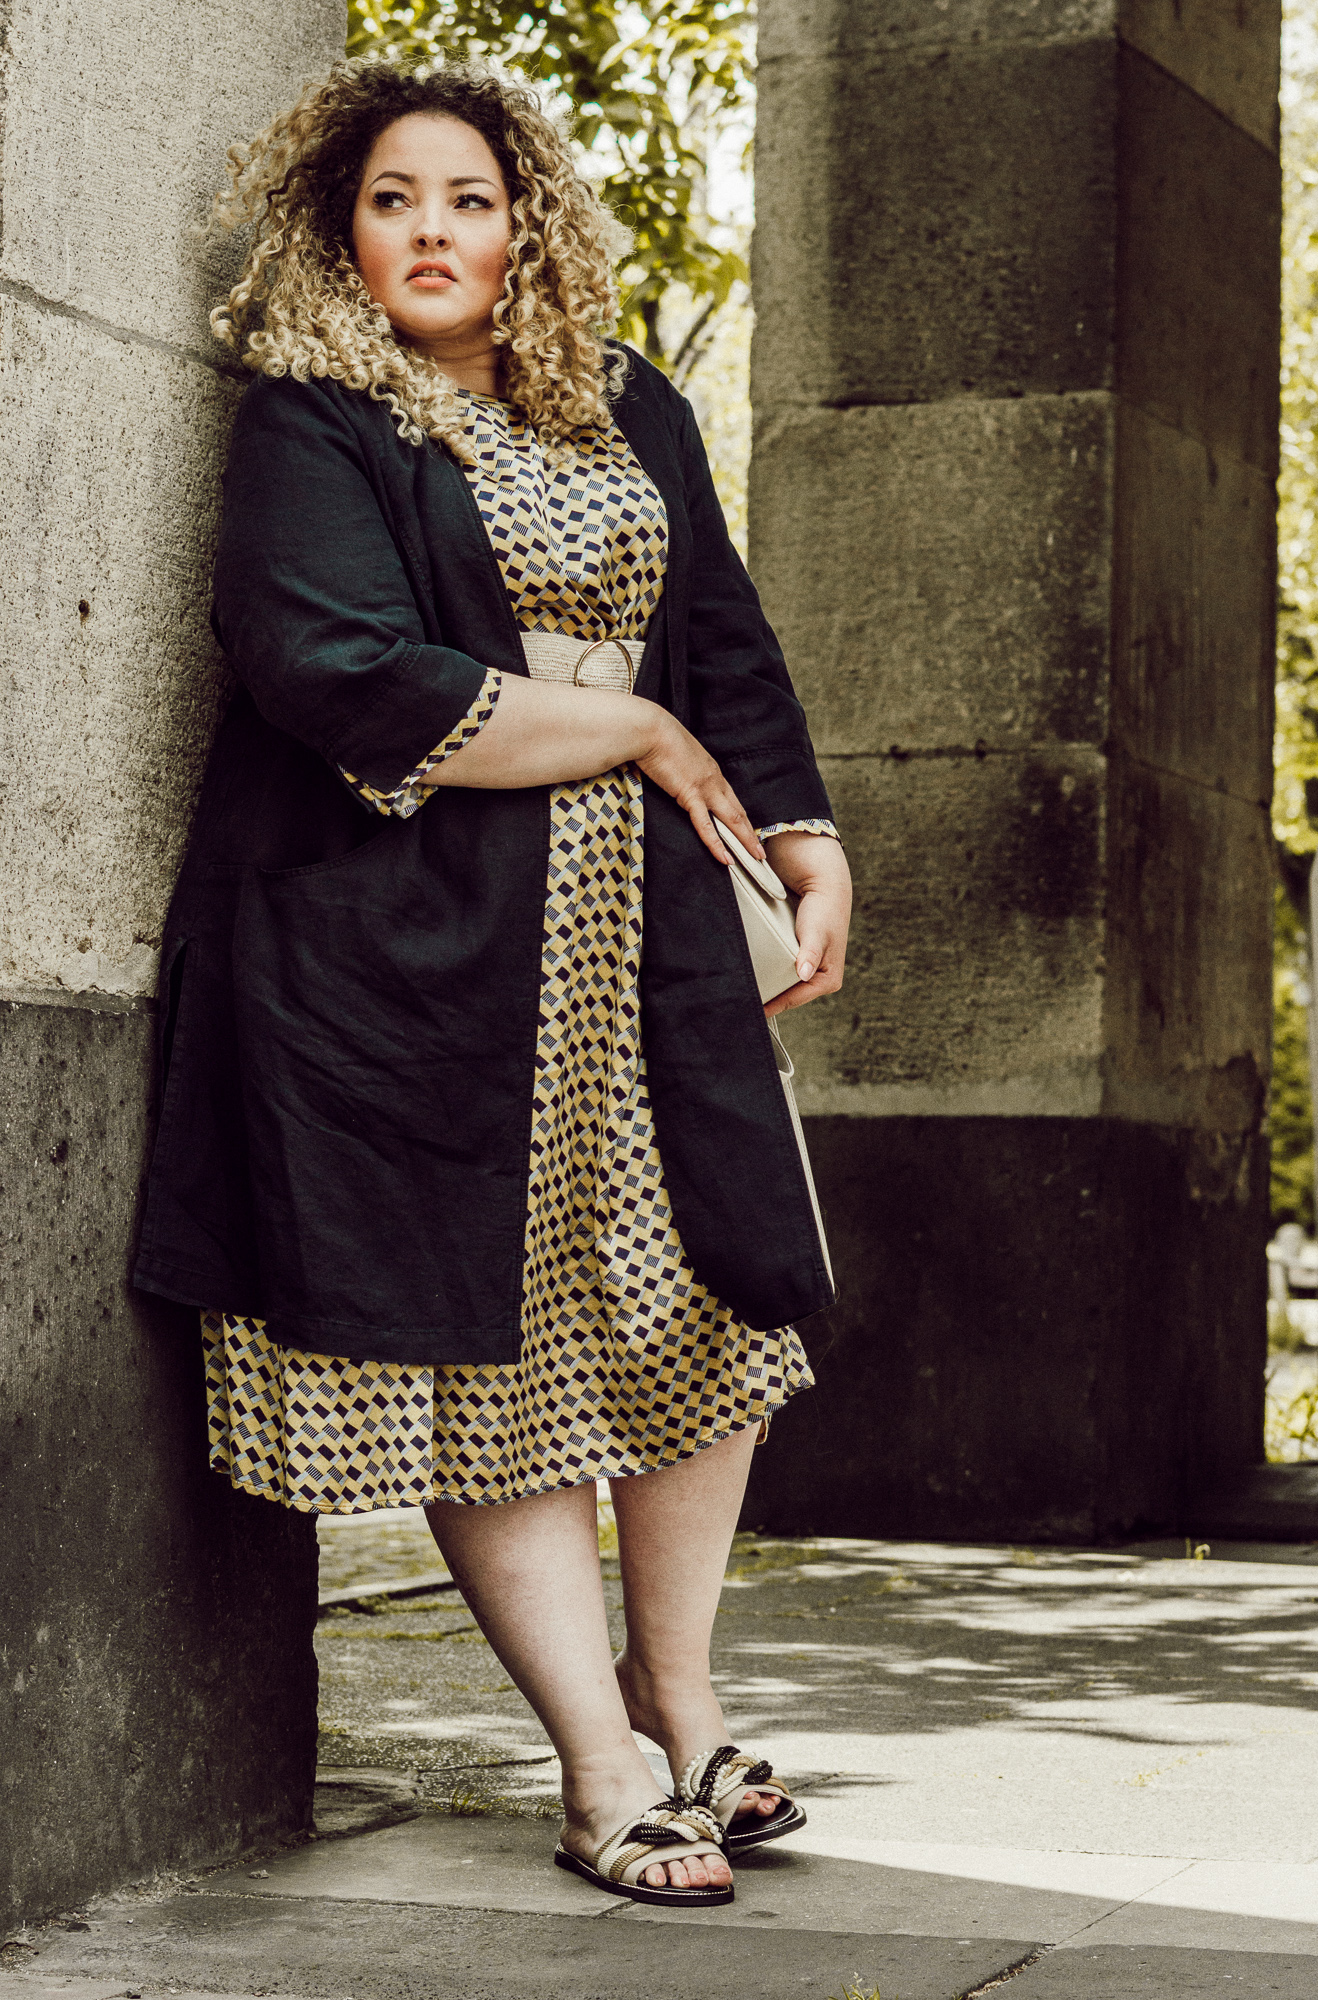 mia_infatstyle_@infatstyle:_blogger_kurvig_große_größen_mode_fashion_blog_model_curvymodel